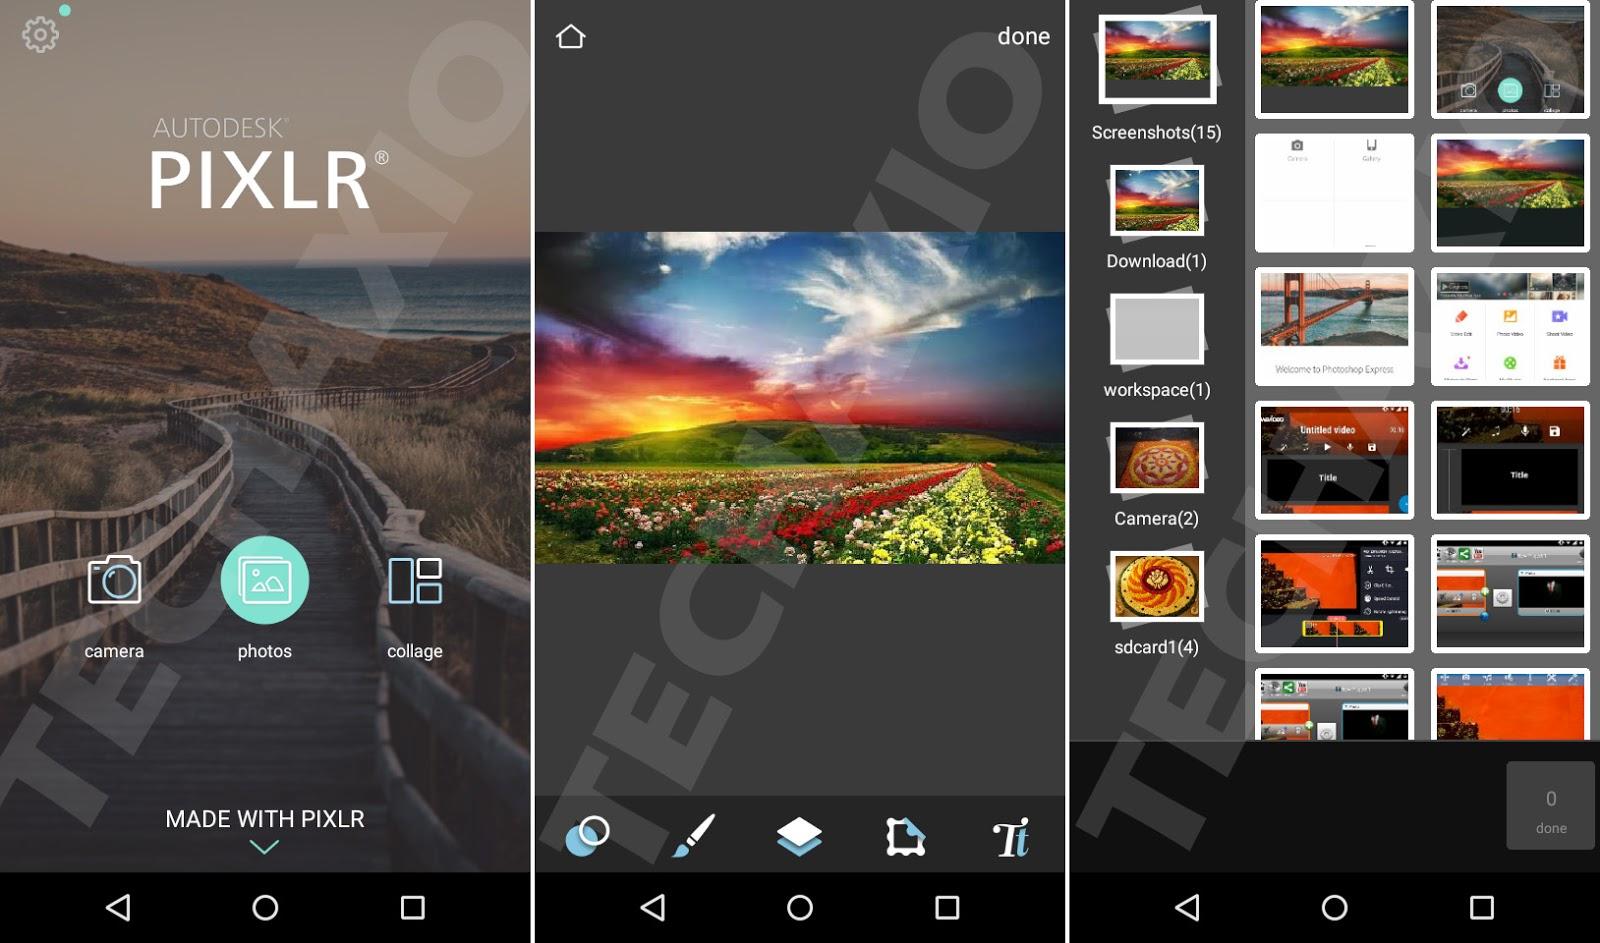 Pixlr App Screenshots